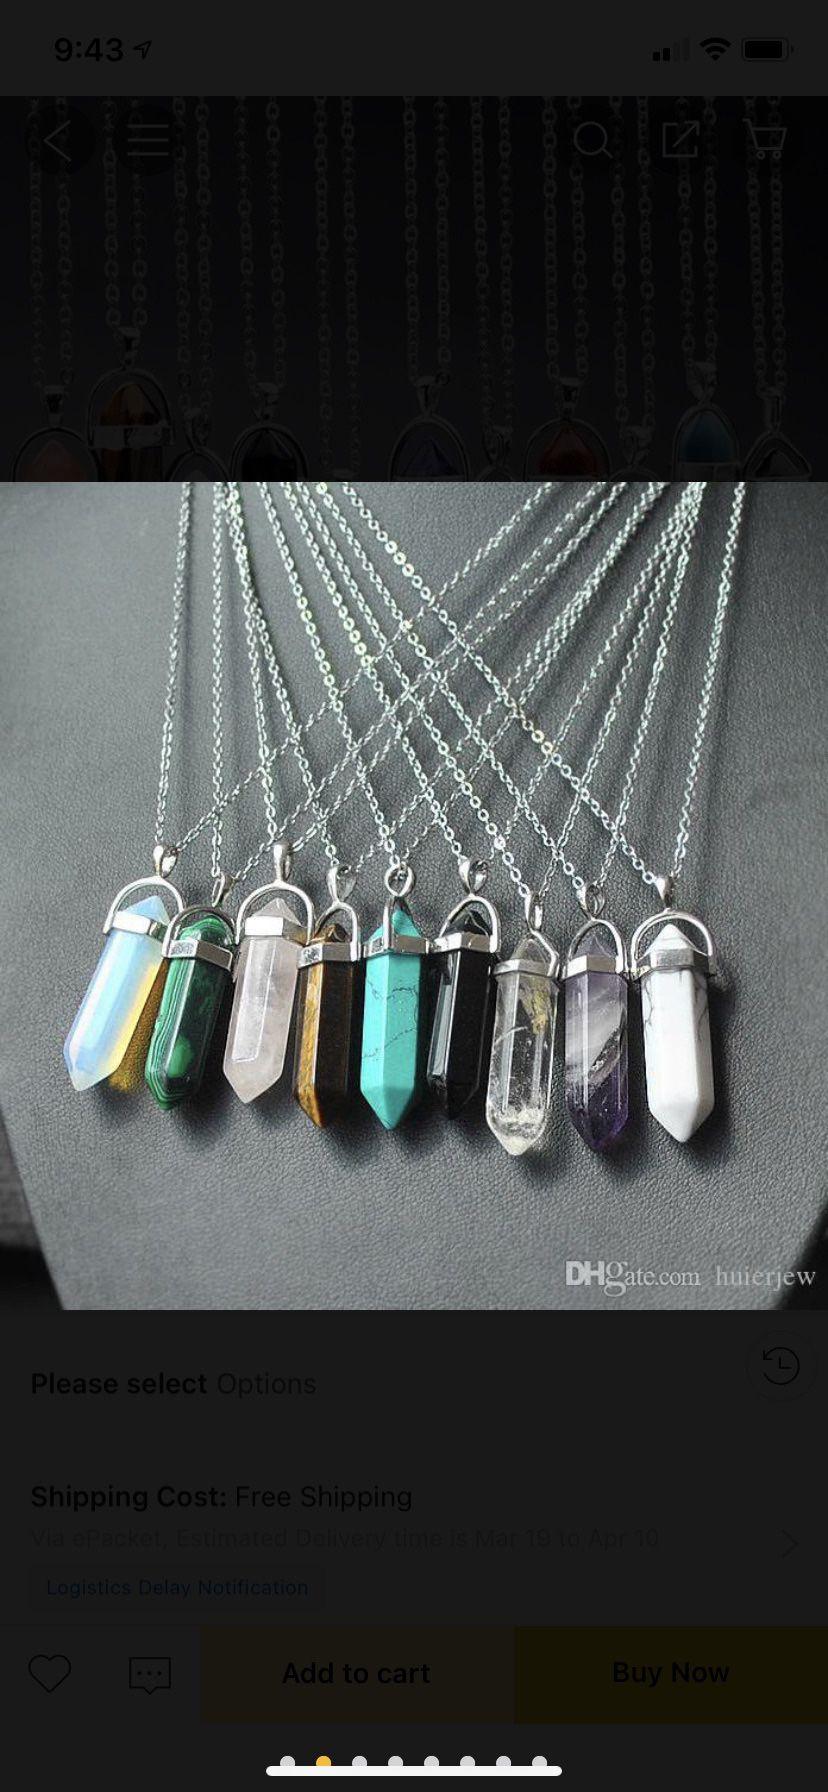 Healing chakra crystals necklaces